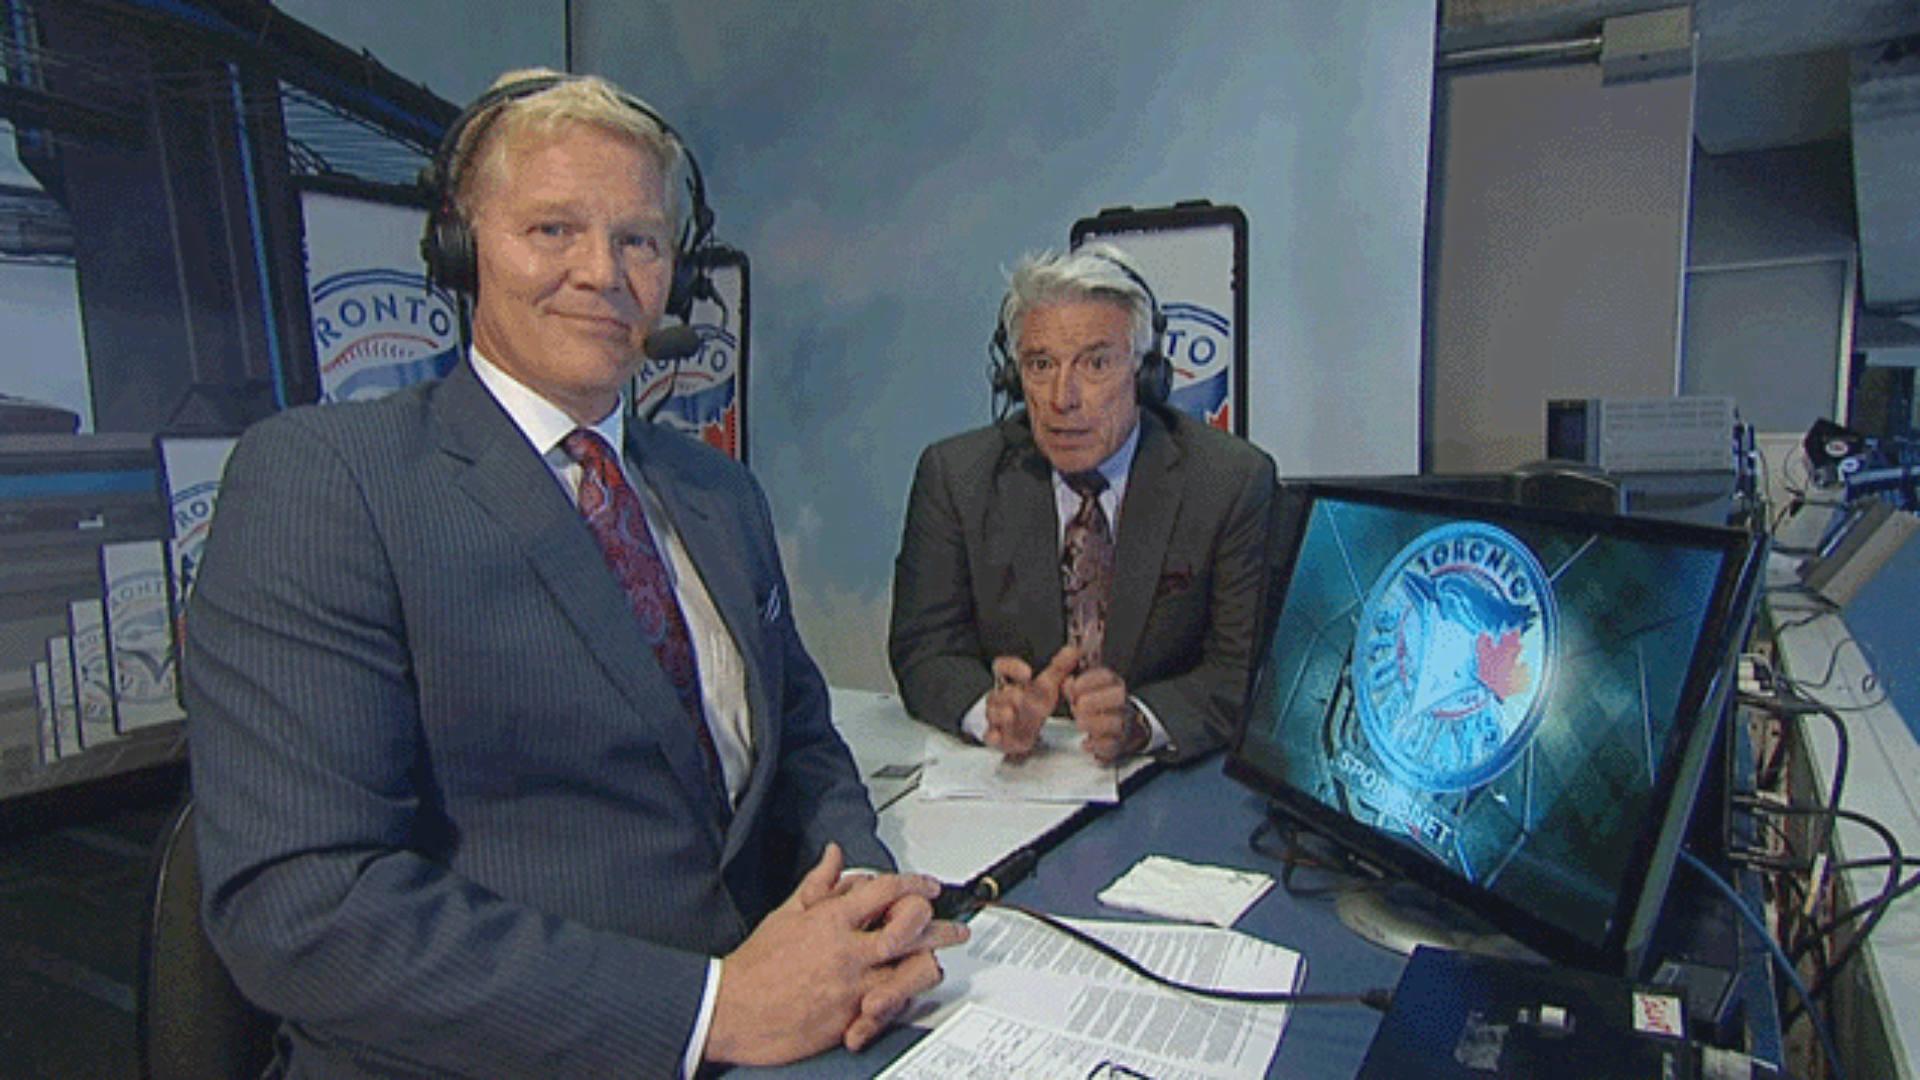 Blue Jays' broadcast seems good until you really start listening